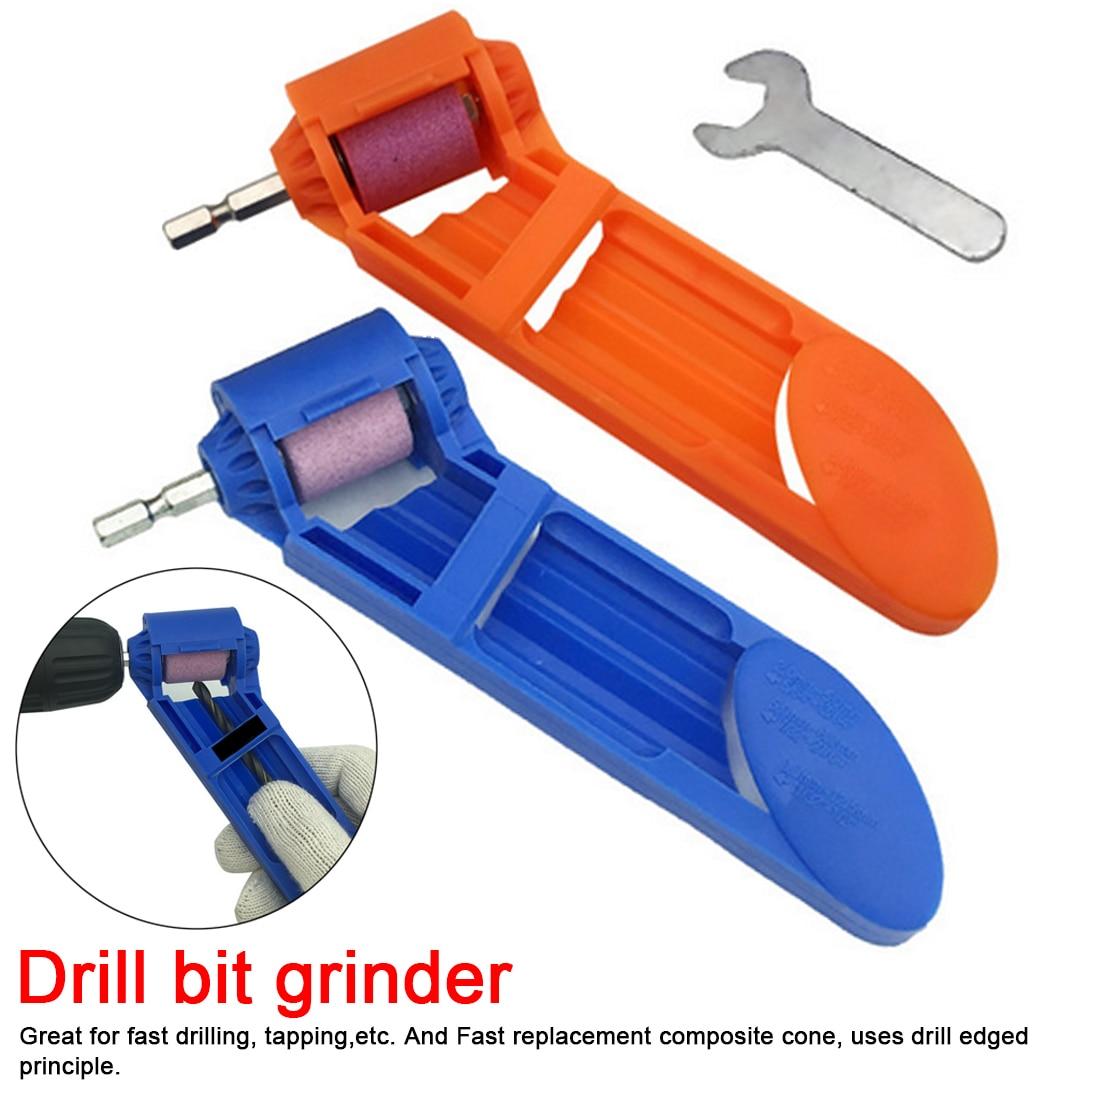 Power Tool 18.5cm Portable Drill Bit Sharpener Corundum Grinding Wheel For Grinder Tools For Drill Sharpener